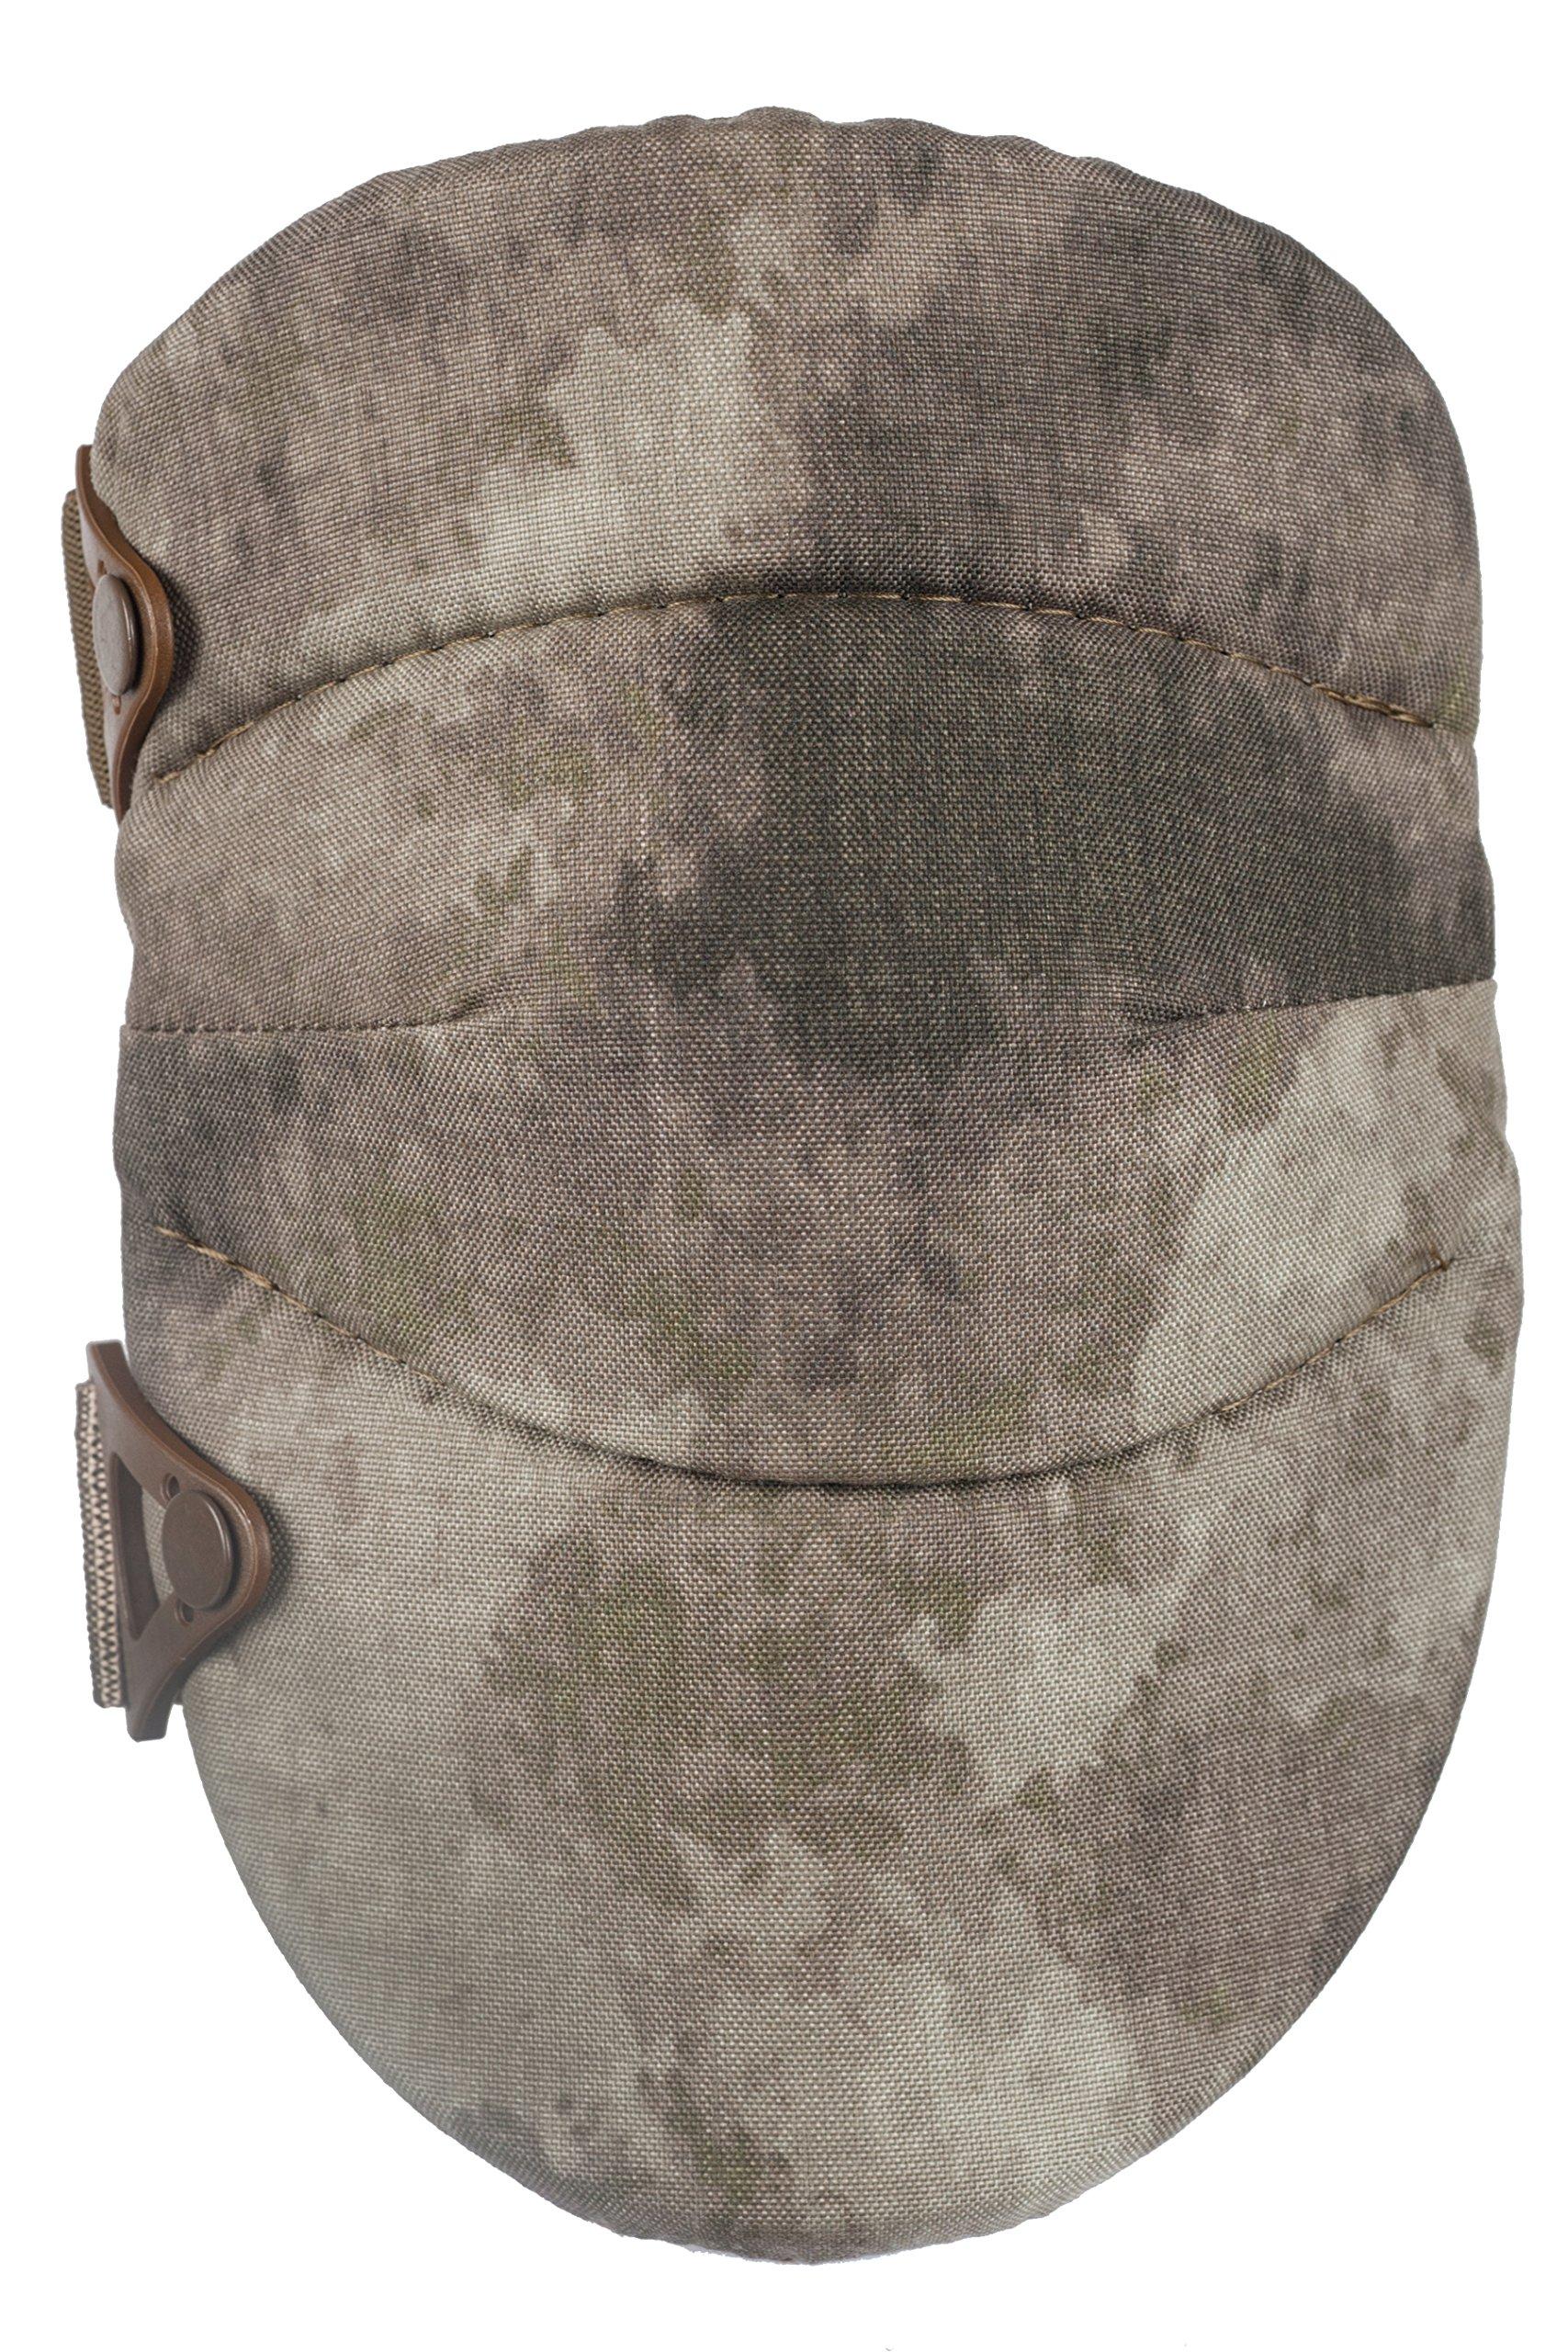 ALTA 50703.18 AltaSOFT Knee Protector Pad, A-TACS AU Cordura Nylon Fabric, AltaLOK Fastening, Capless